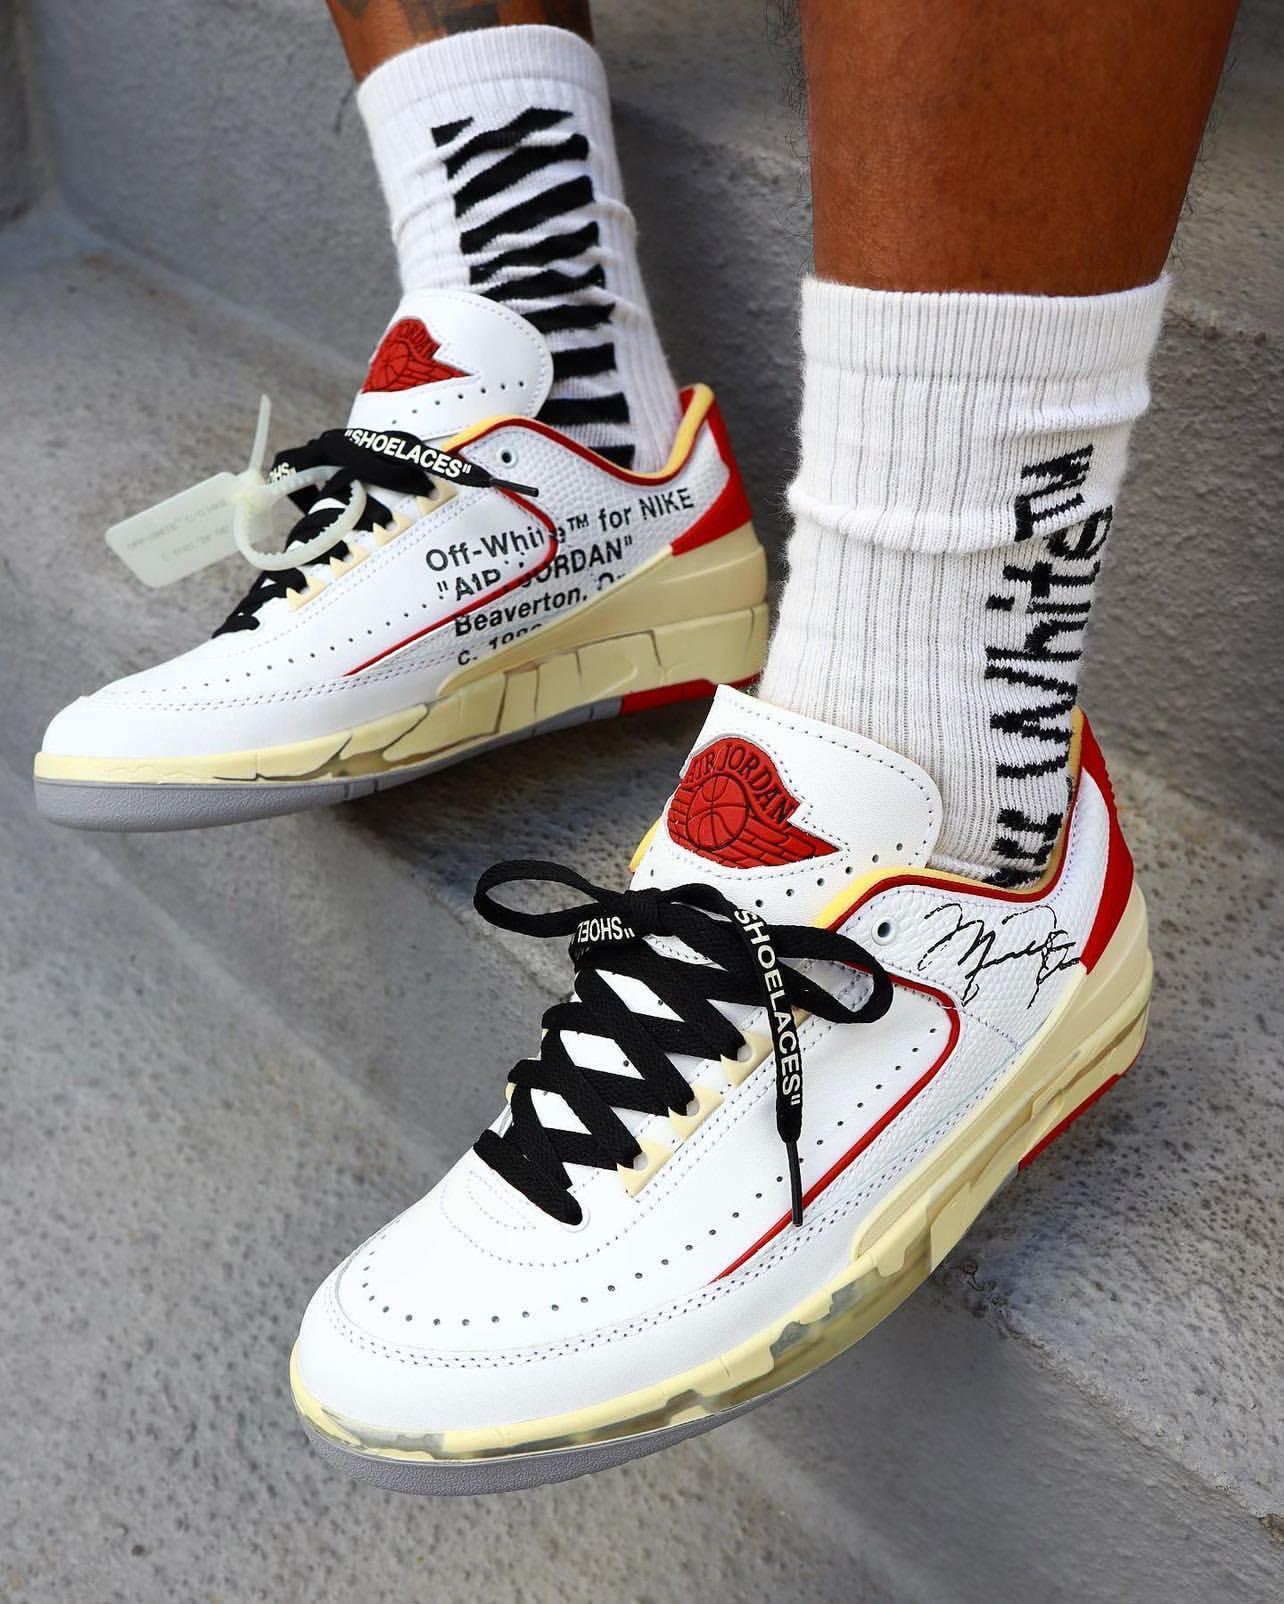 Off-White-Air-Jordan-2-Low-White-Red-DJ4375-106-On-Feet